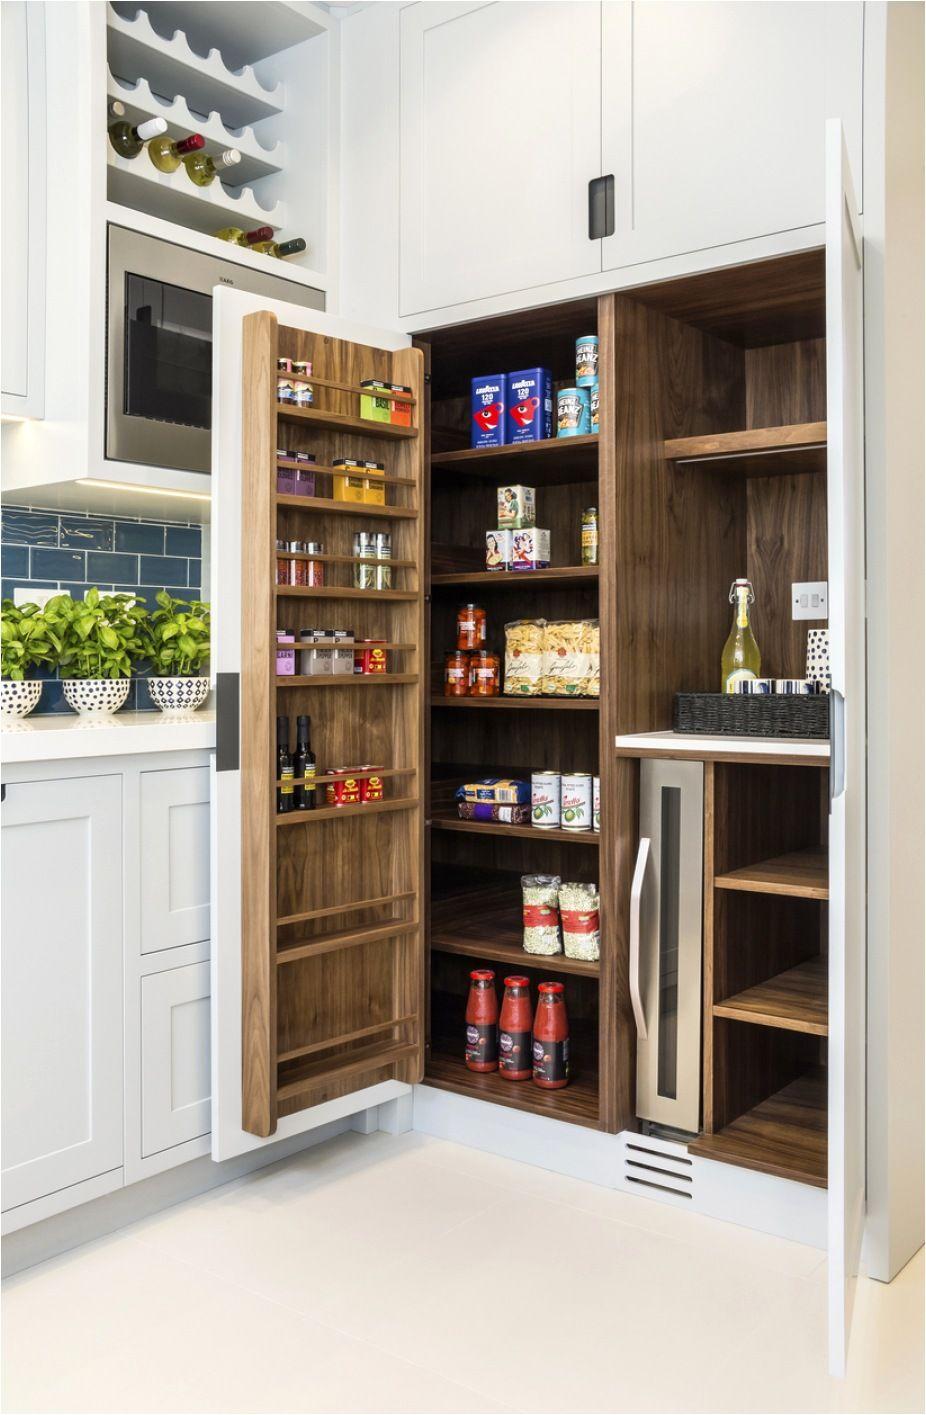 Kitchen Design Ideas 7 Ways To Increase Storage In A In 2021 Kitchen Design Victorian Townhouse Kitchen Decor Items